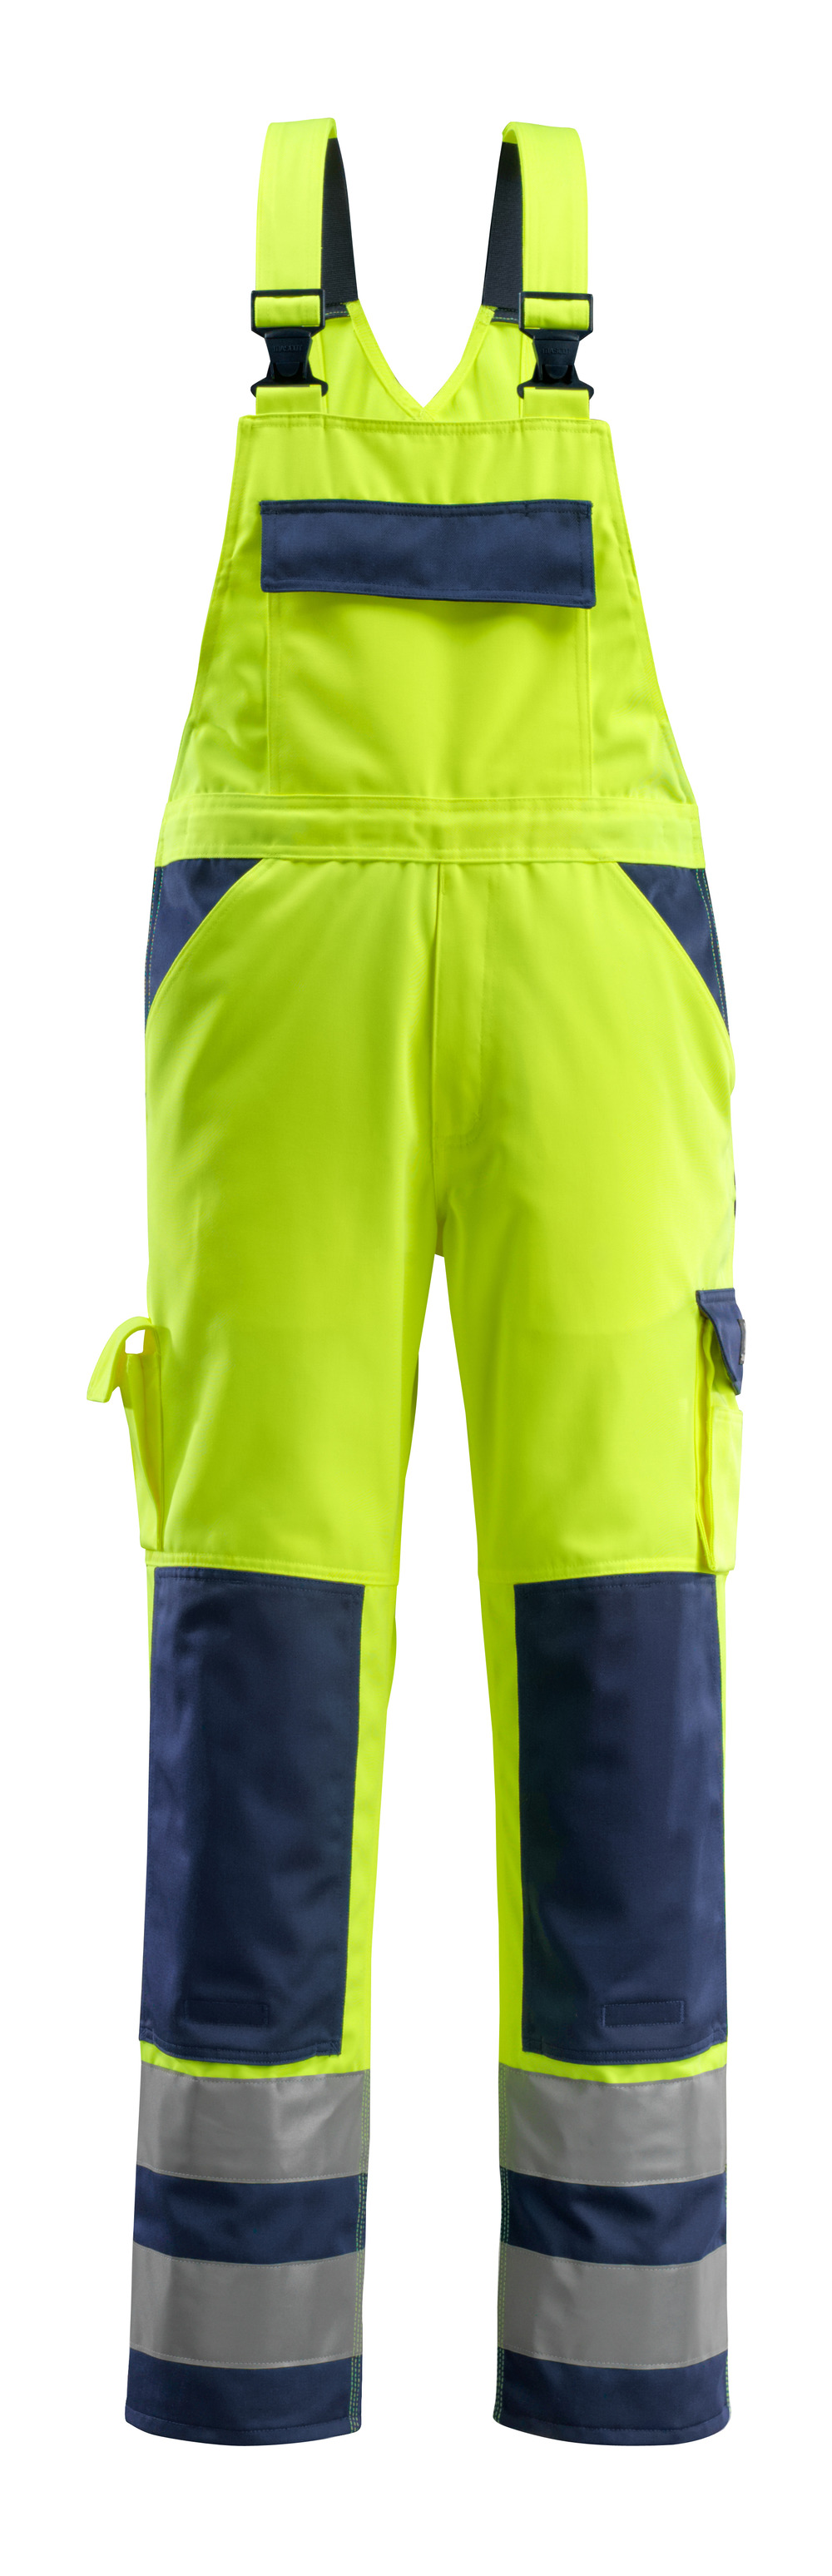 07169-470-171 Bib & Brace with kneepad pockets - hi-vis yellow/navy